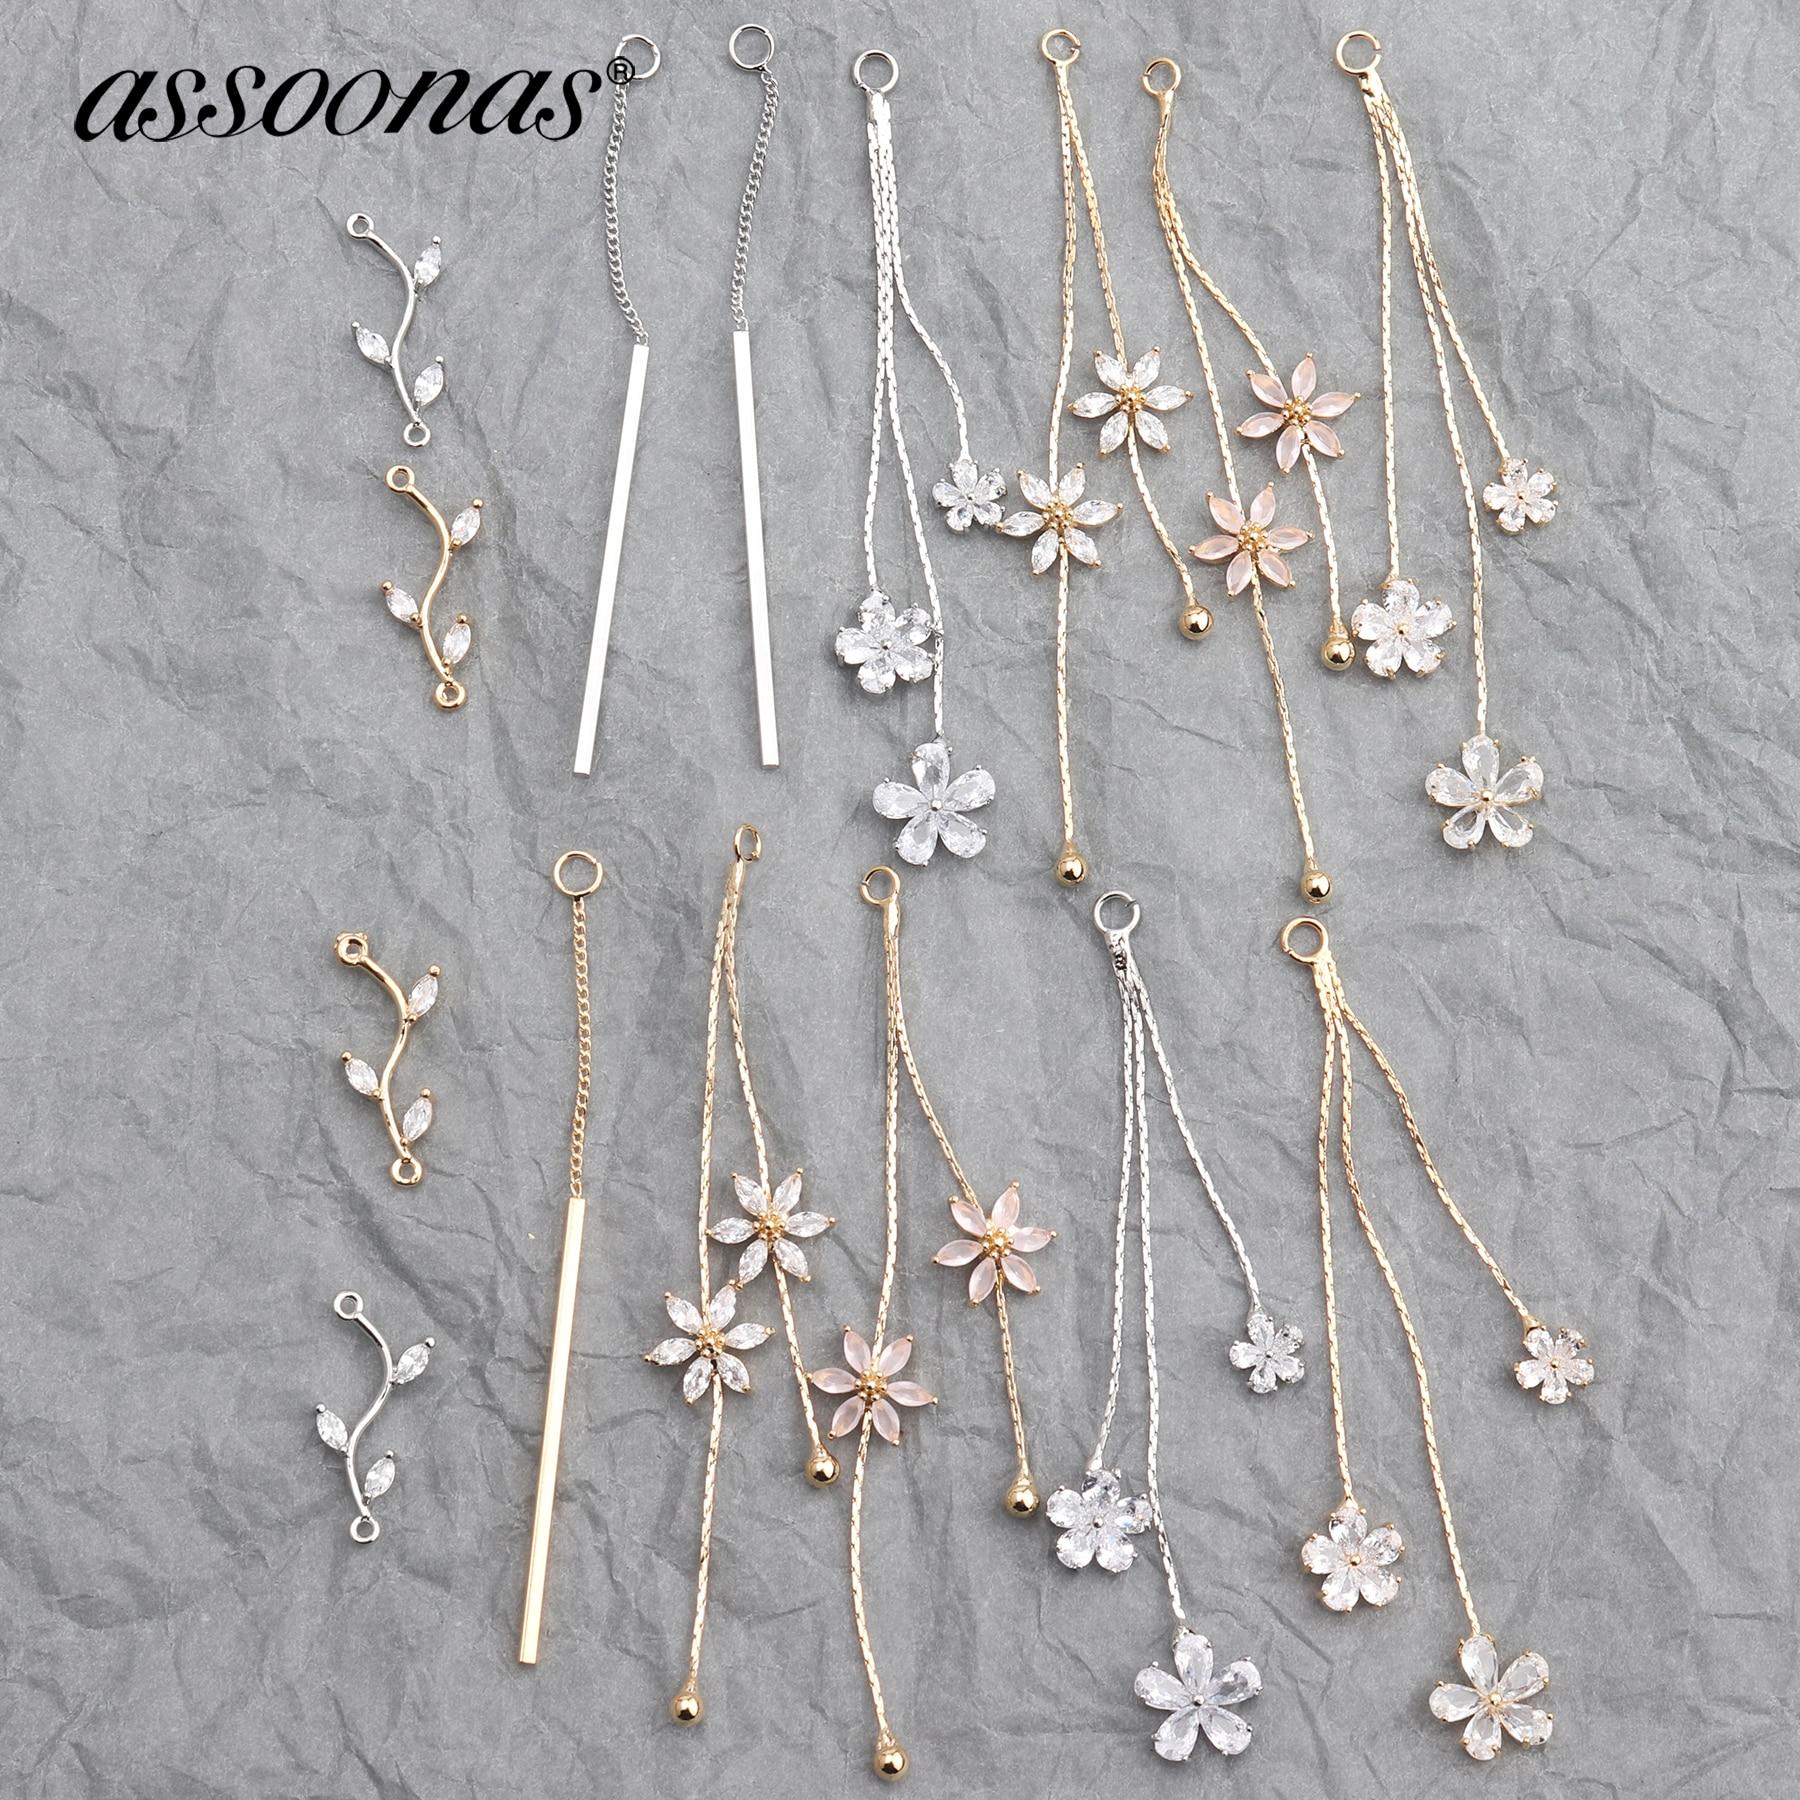 Assoonas M579,jewelry Accessories,earrings Stud,metal Jewelry,hand Made,jewelry Findings,jewelry Making,diy Earrings,10pcs/lot